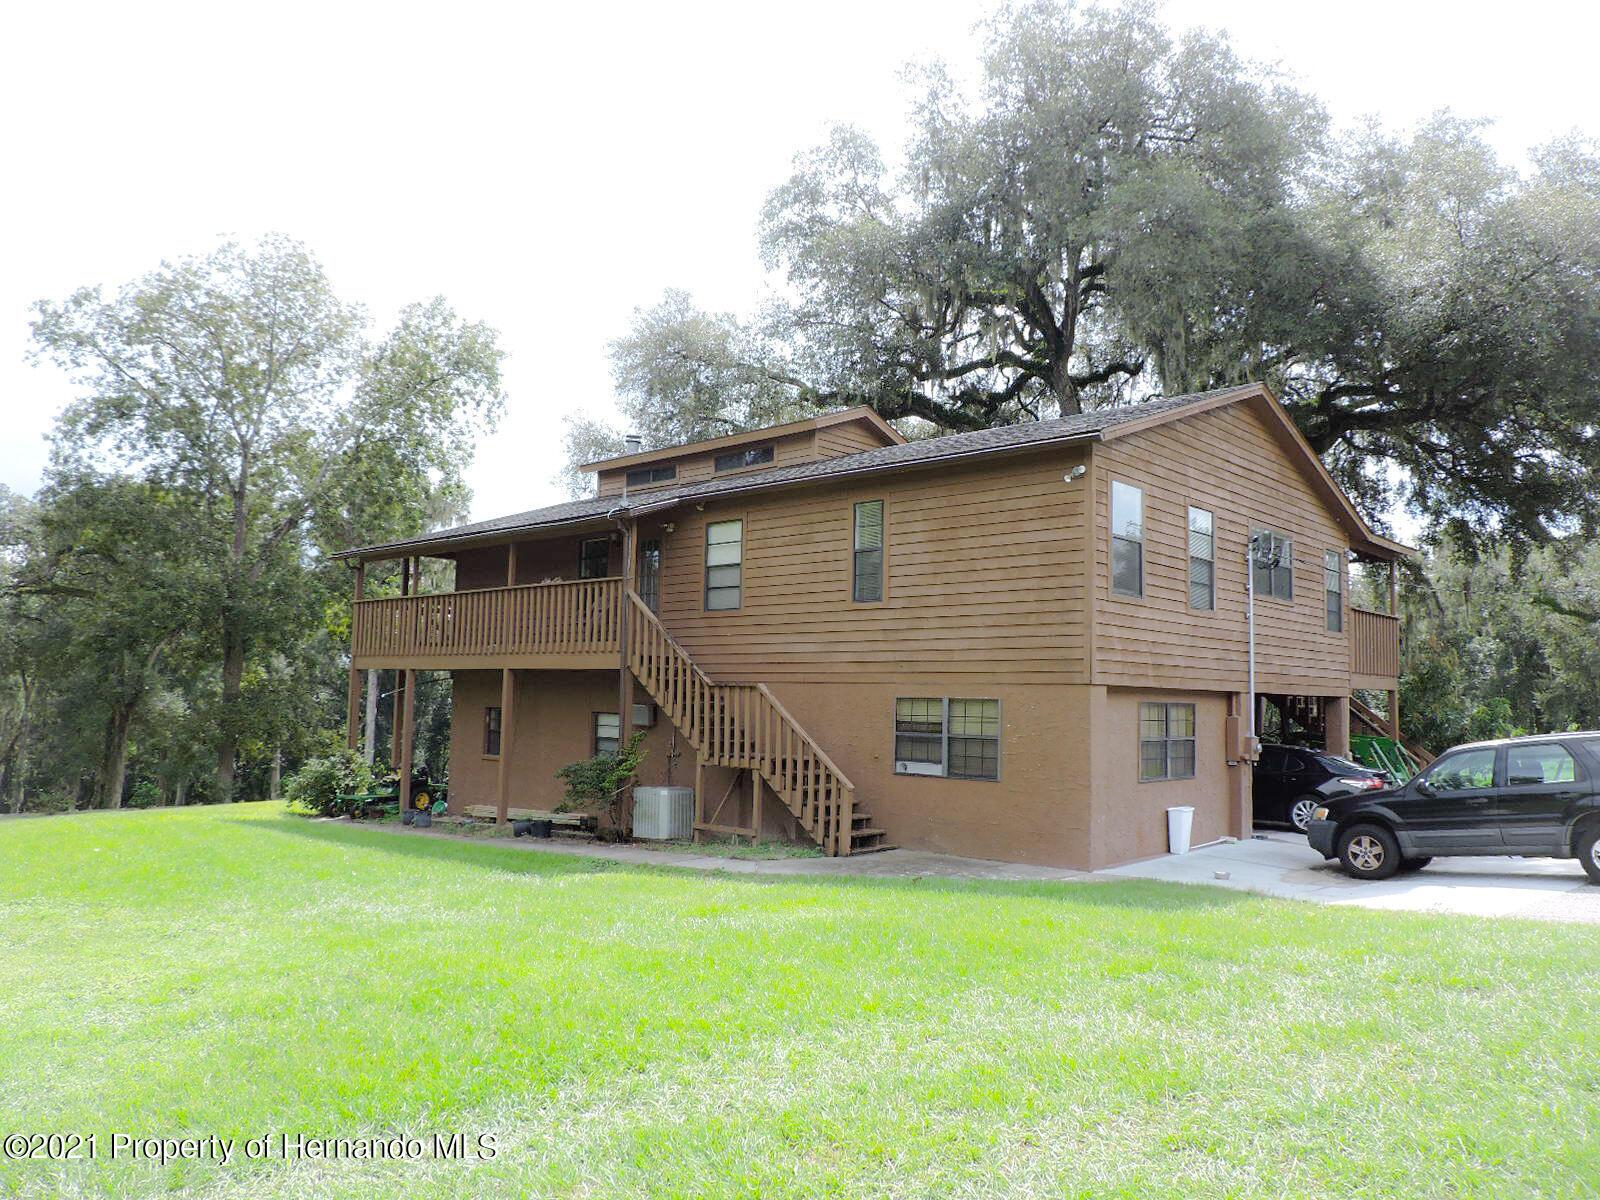 Details for 18530 Lake Iola Road, Dade City, FL 33523